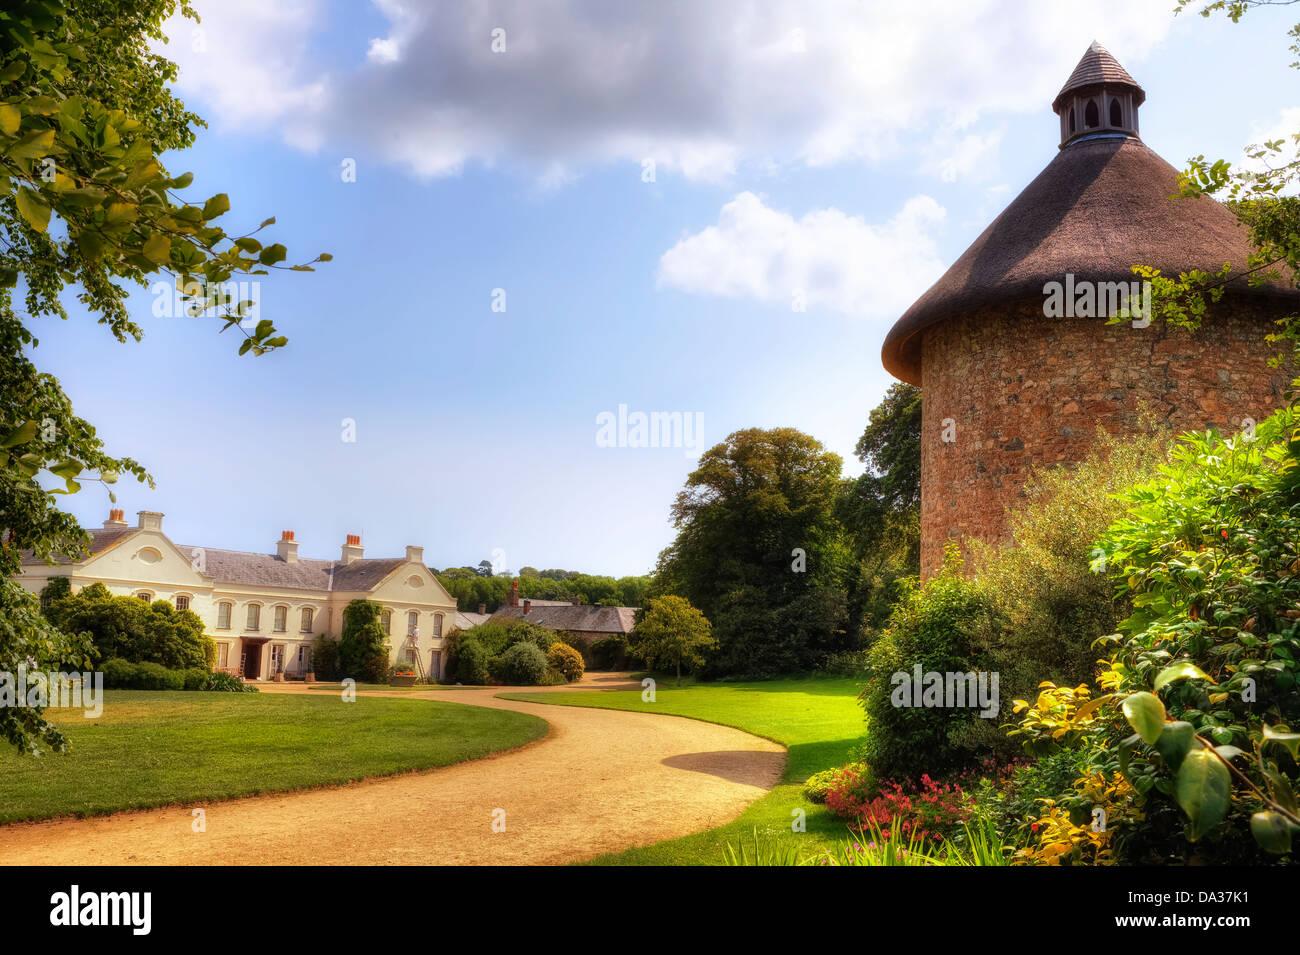 Samares Manor, Jersey, United Kingdom - Stock Image